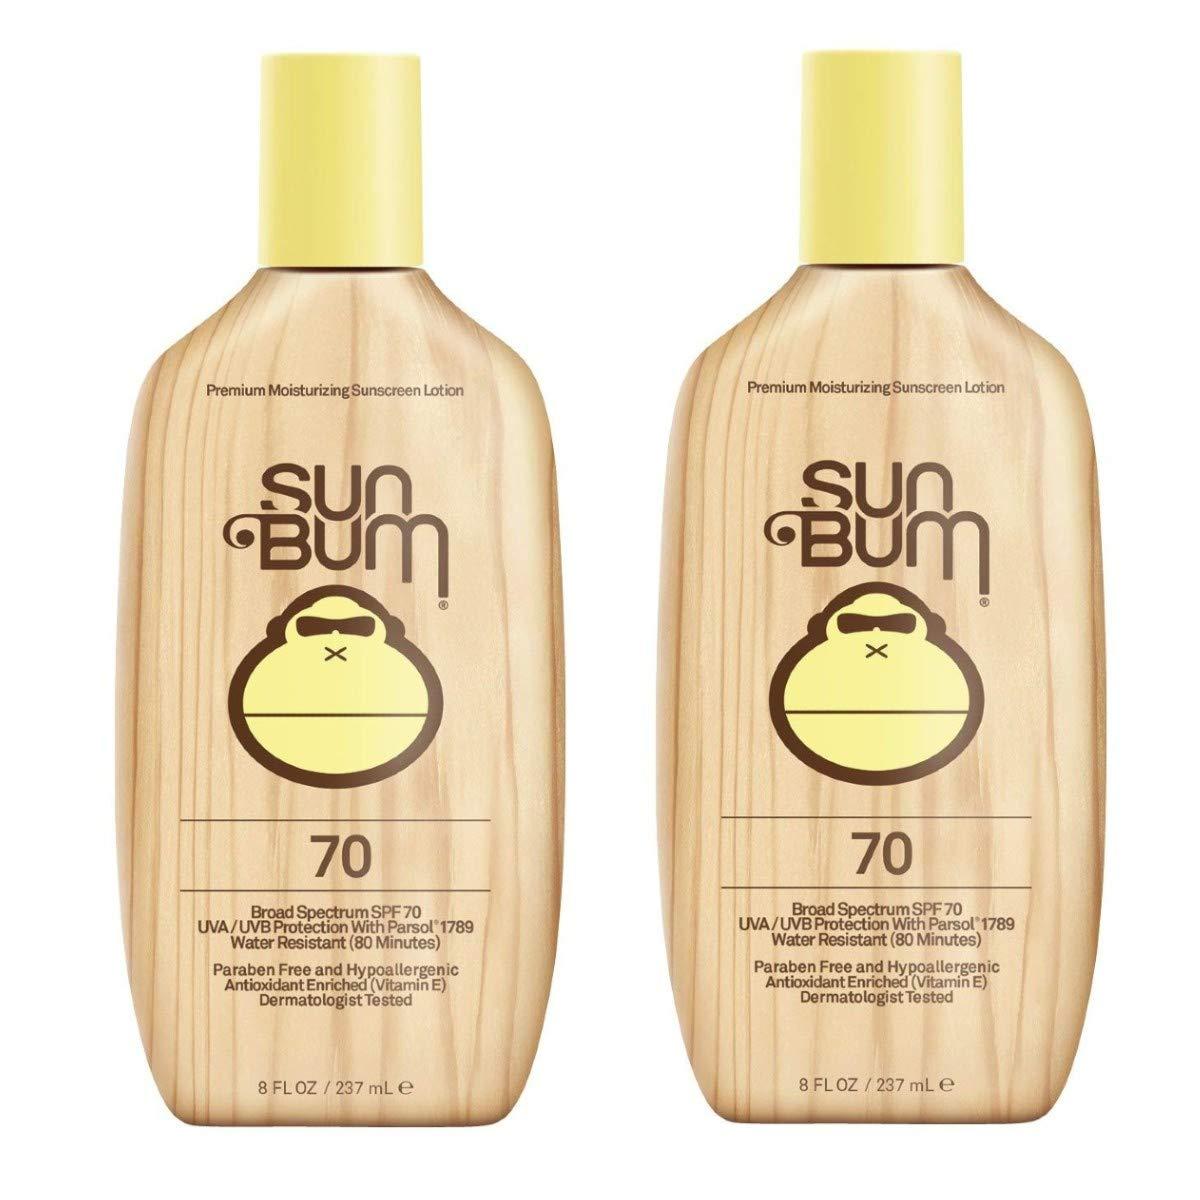 Sun Bum Original Moisturizing Sunscreen Lotion, Broad Spectrum UVA, UVB Protection, Hypoallergenic, Paraben Free, Gluten Free, 8 ounce, 2 Count